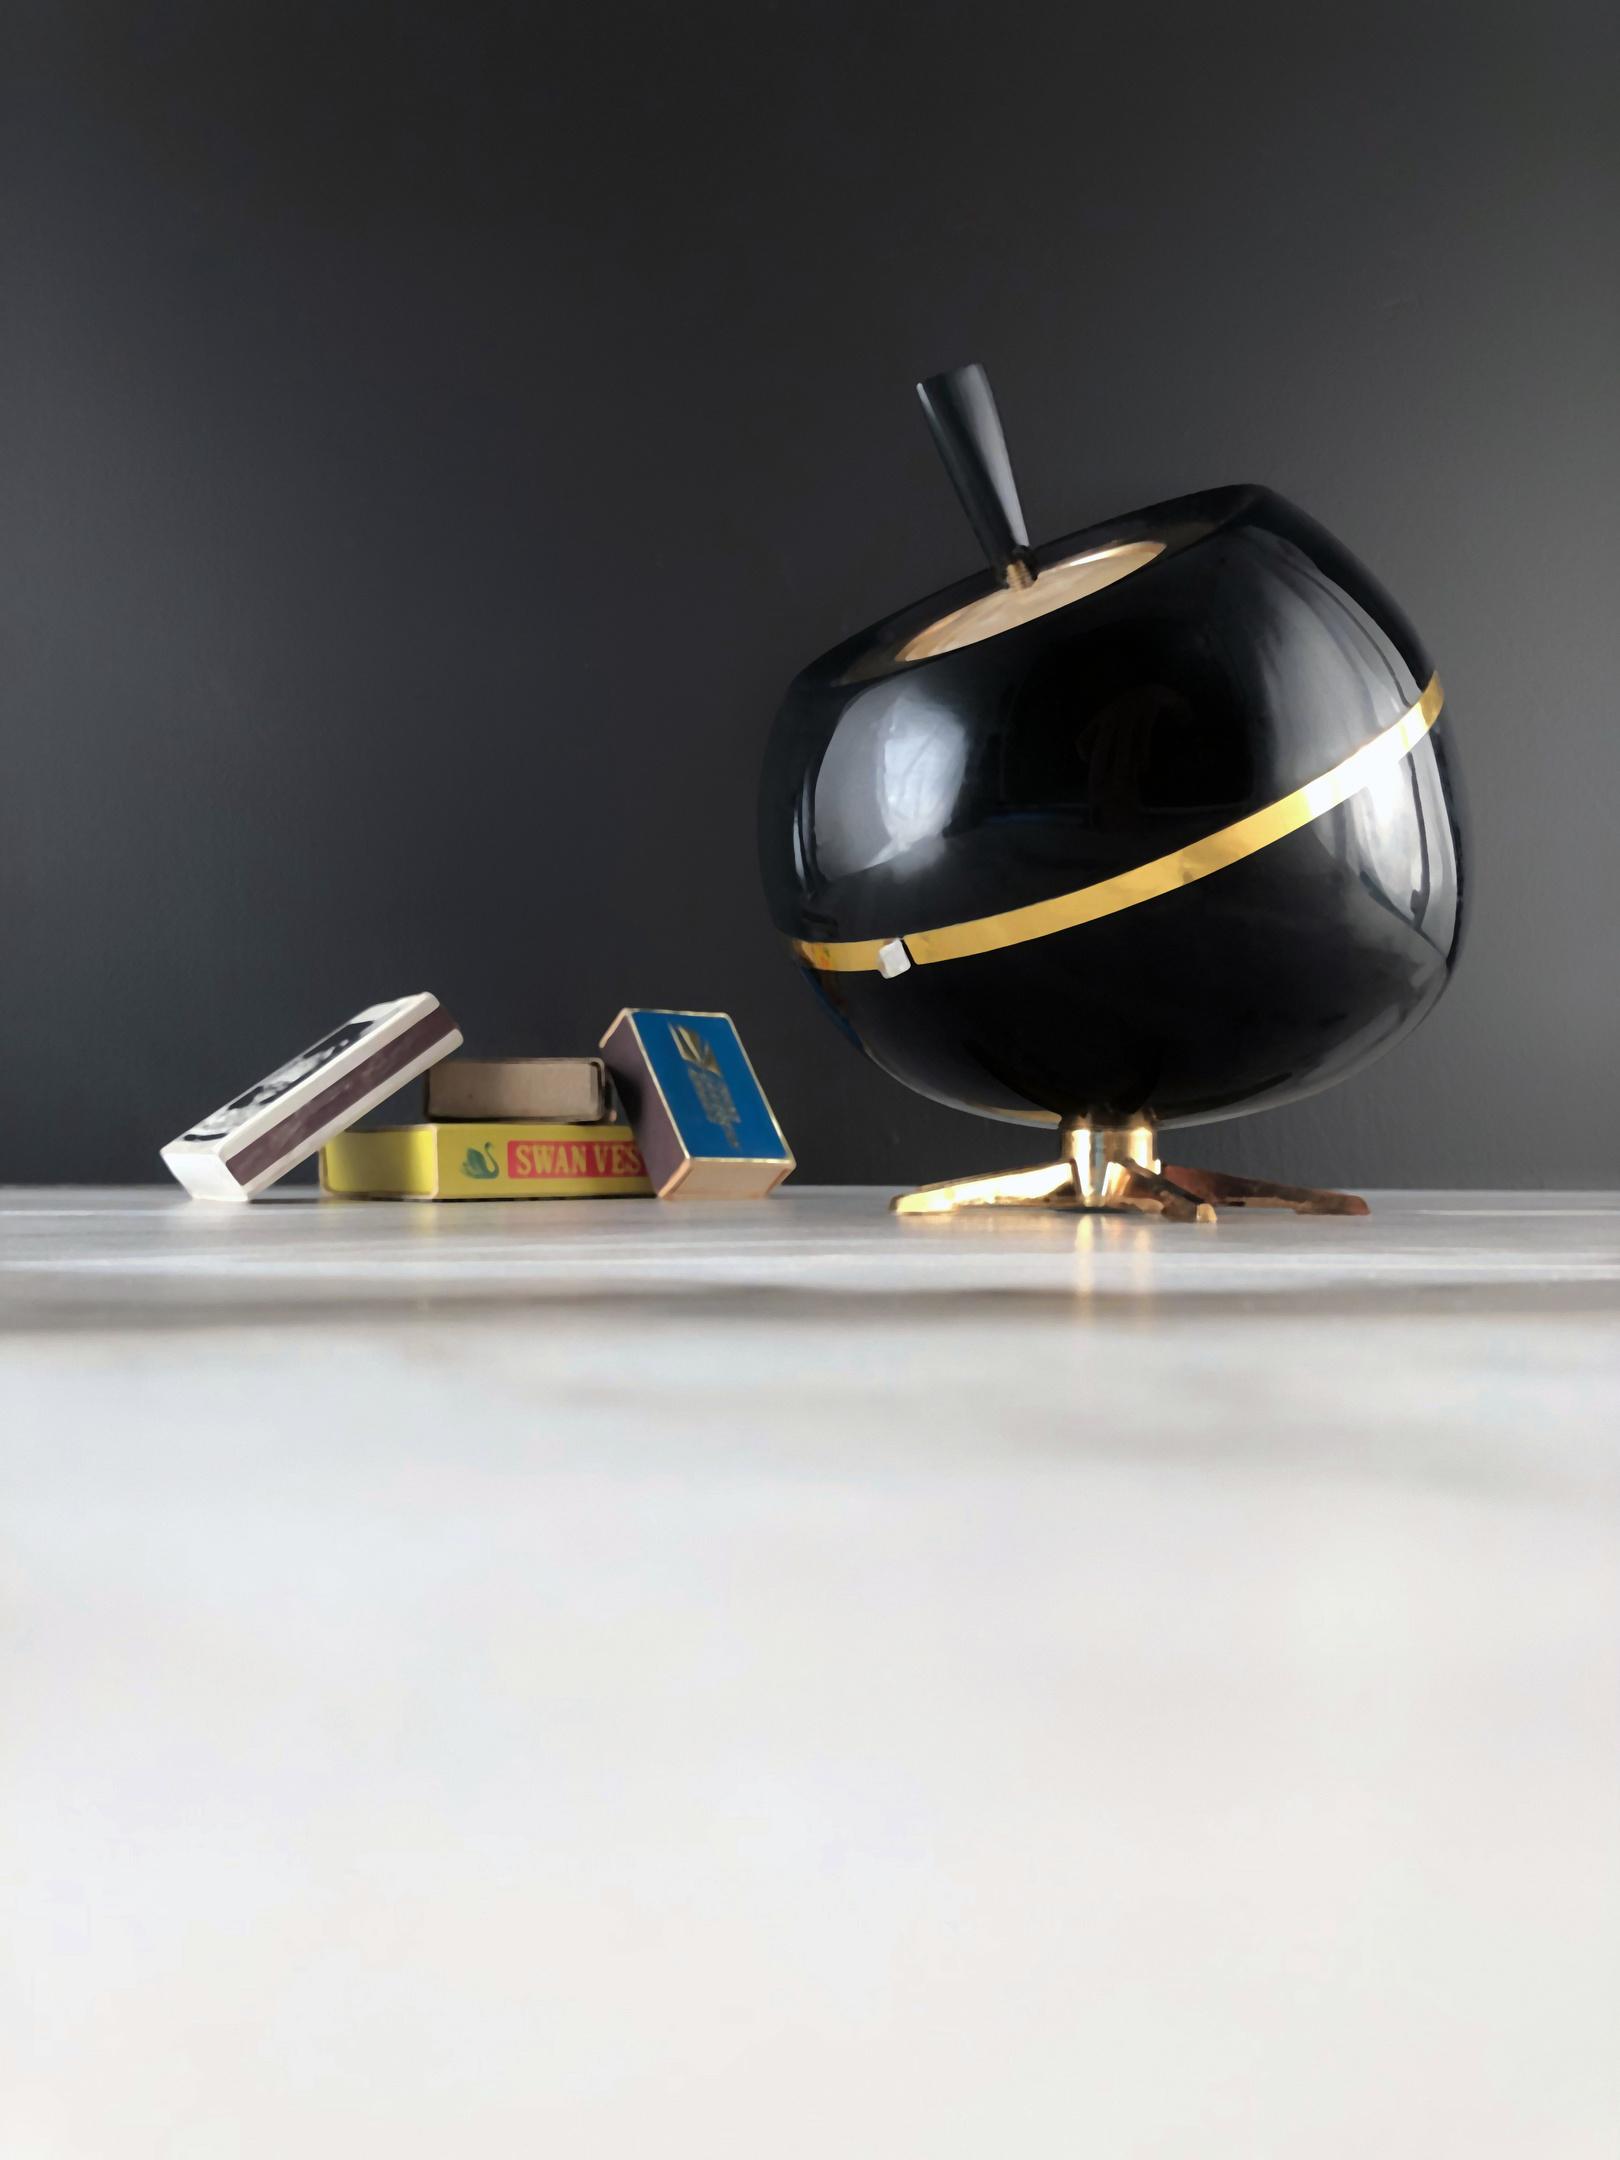 Super Vintage Electro Match Table Cigarette Lighter Collectors Interior Design Ideas Gentotryabchikinfo